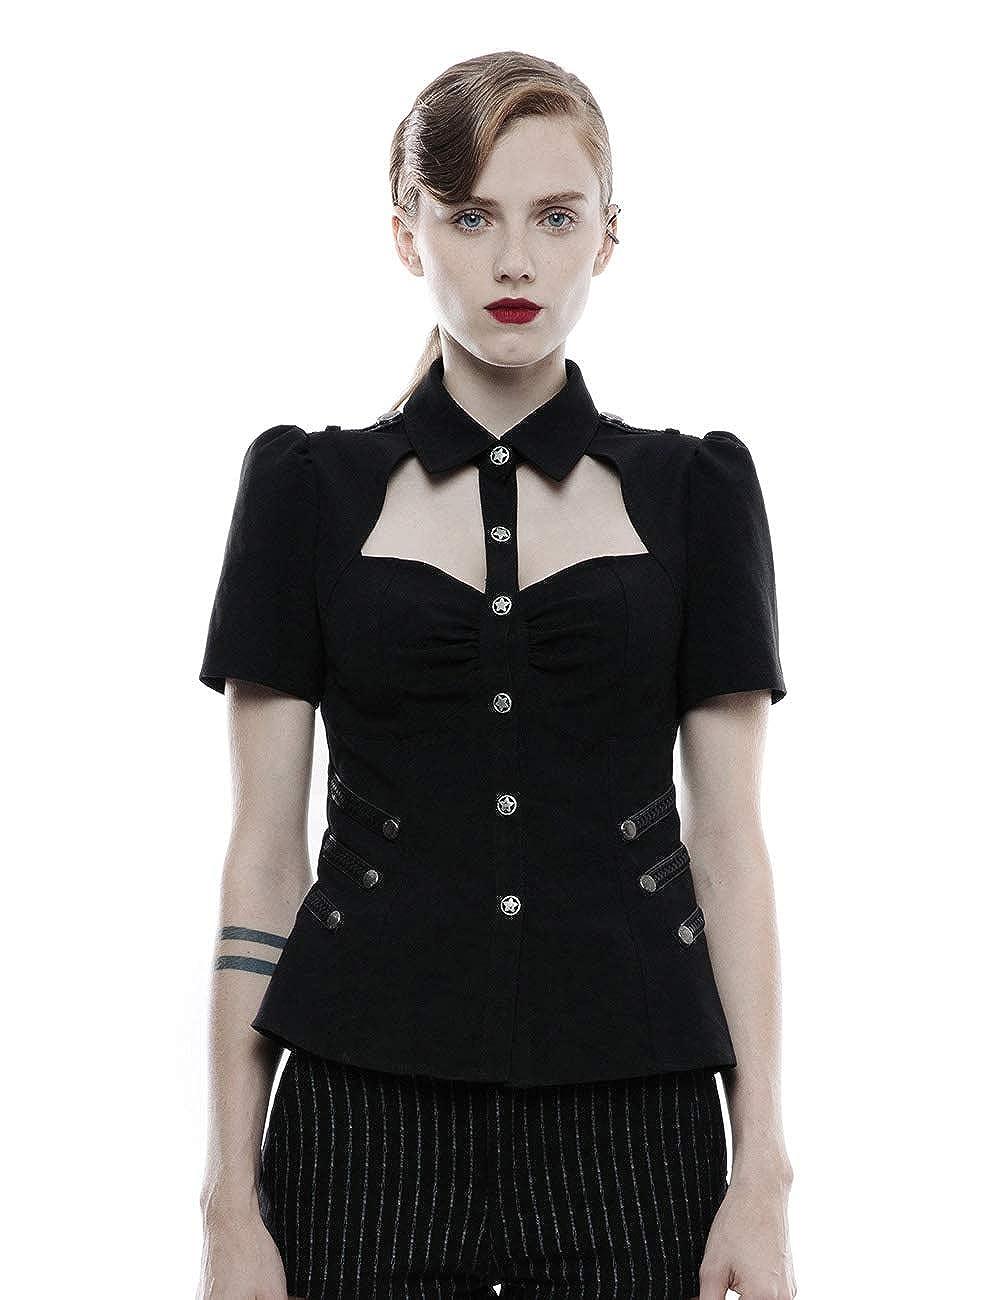 Black Punk Rave Women's Steampunk Military Uniform Short Sleeve Shirt Casual Blouse